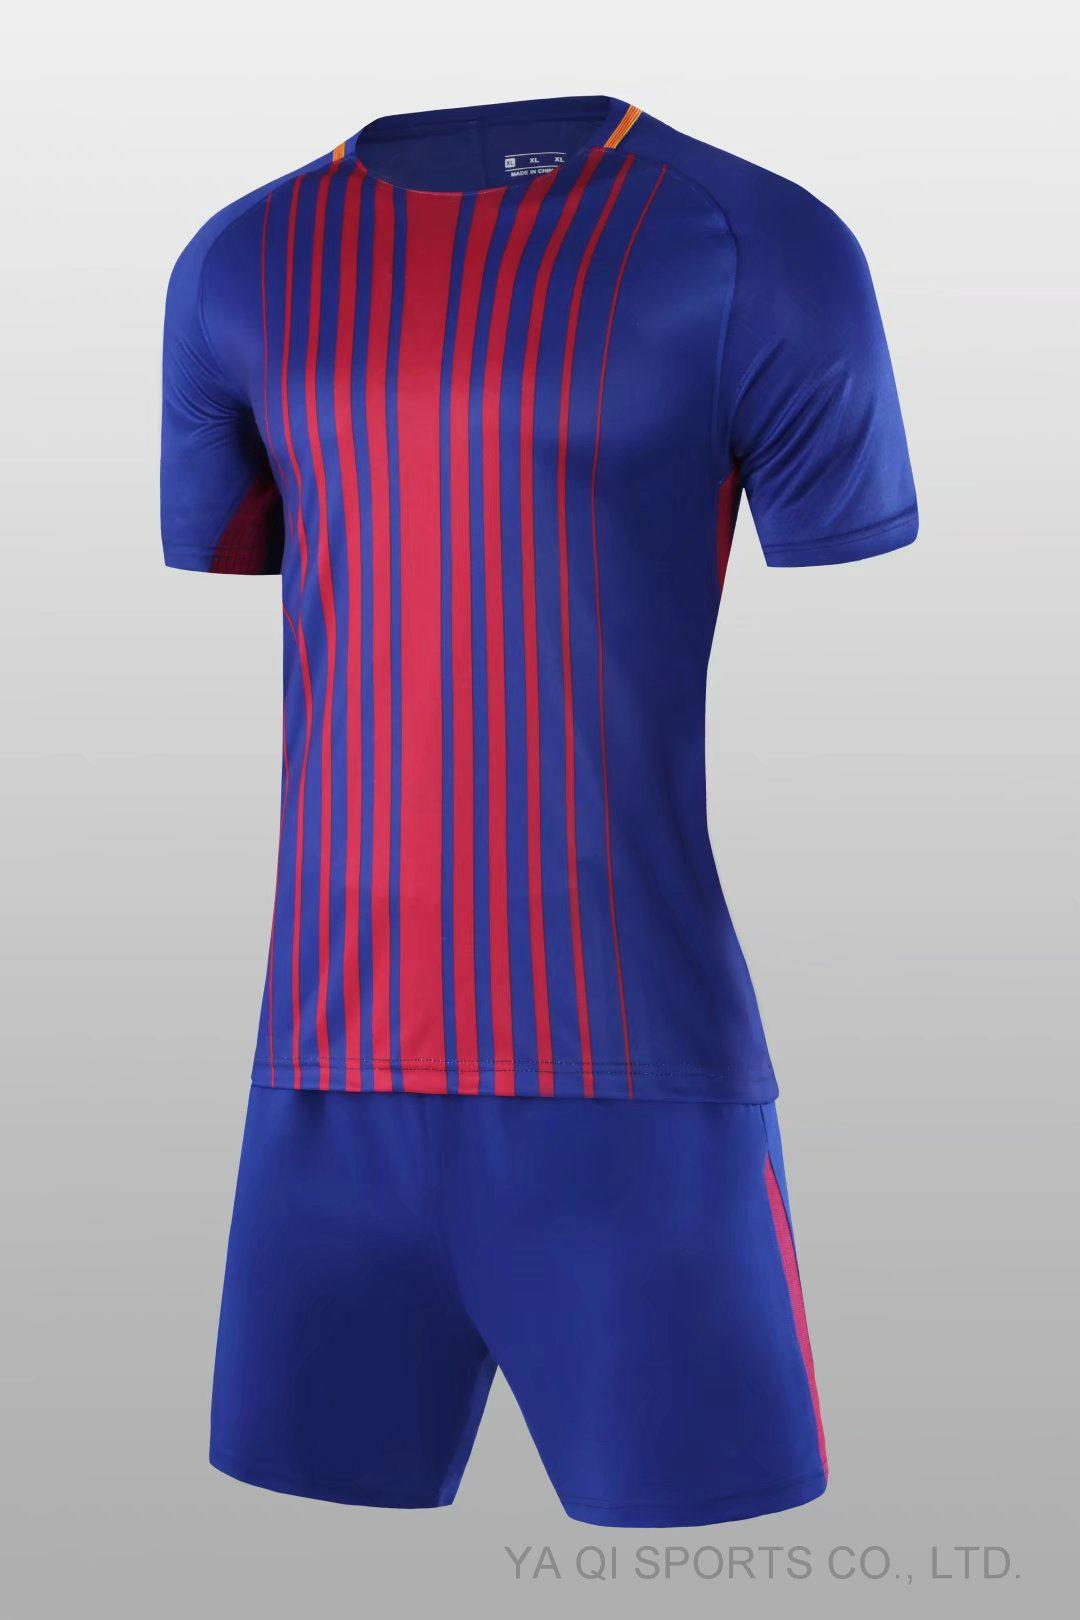 921d22629 China Original Soccer Jerseys